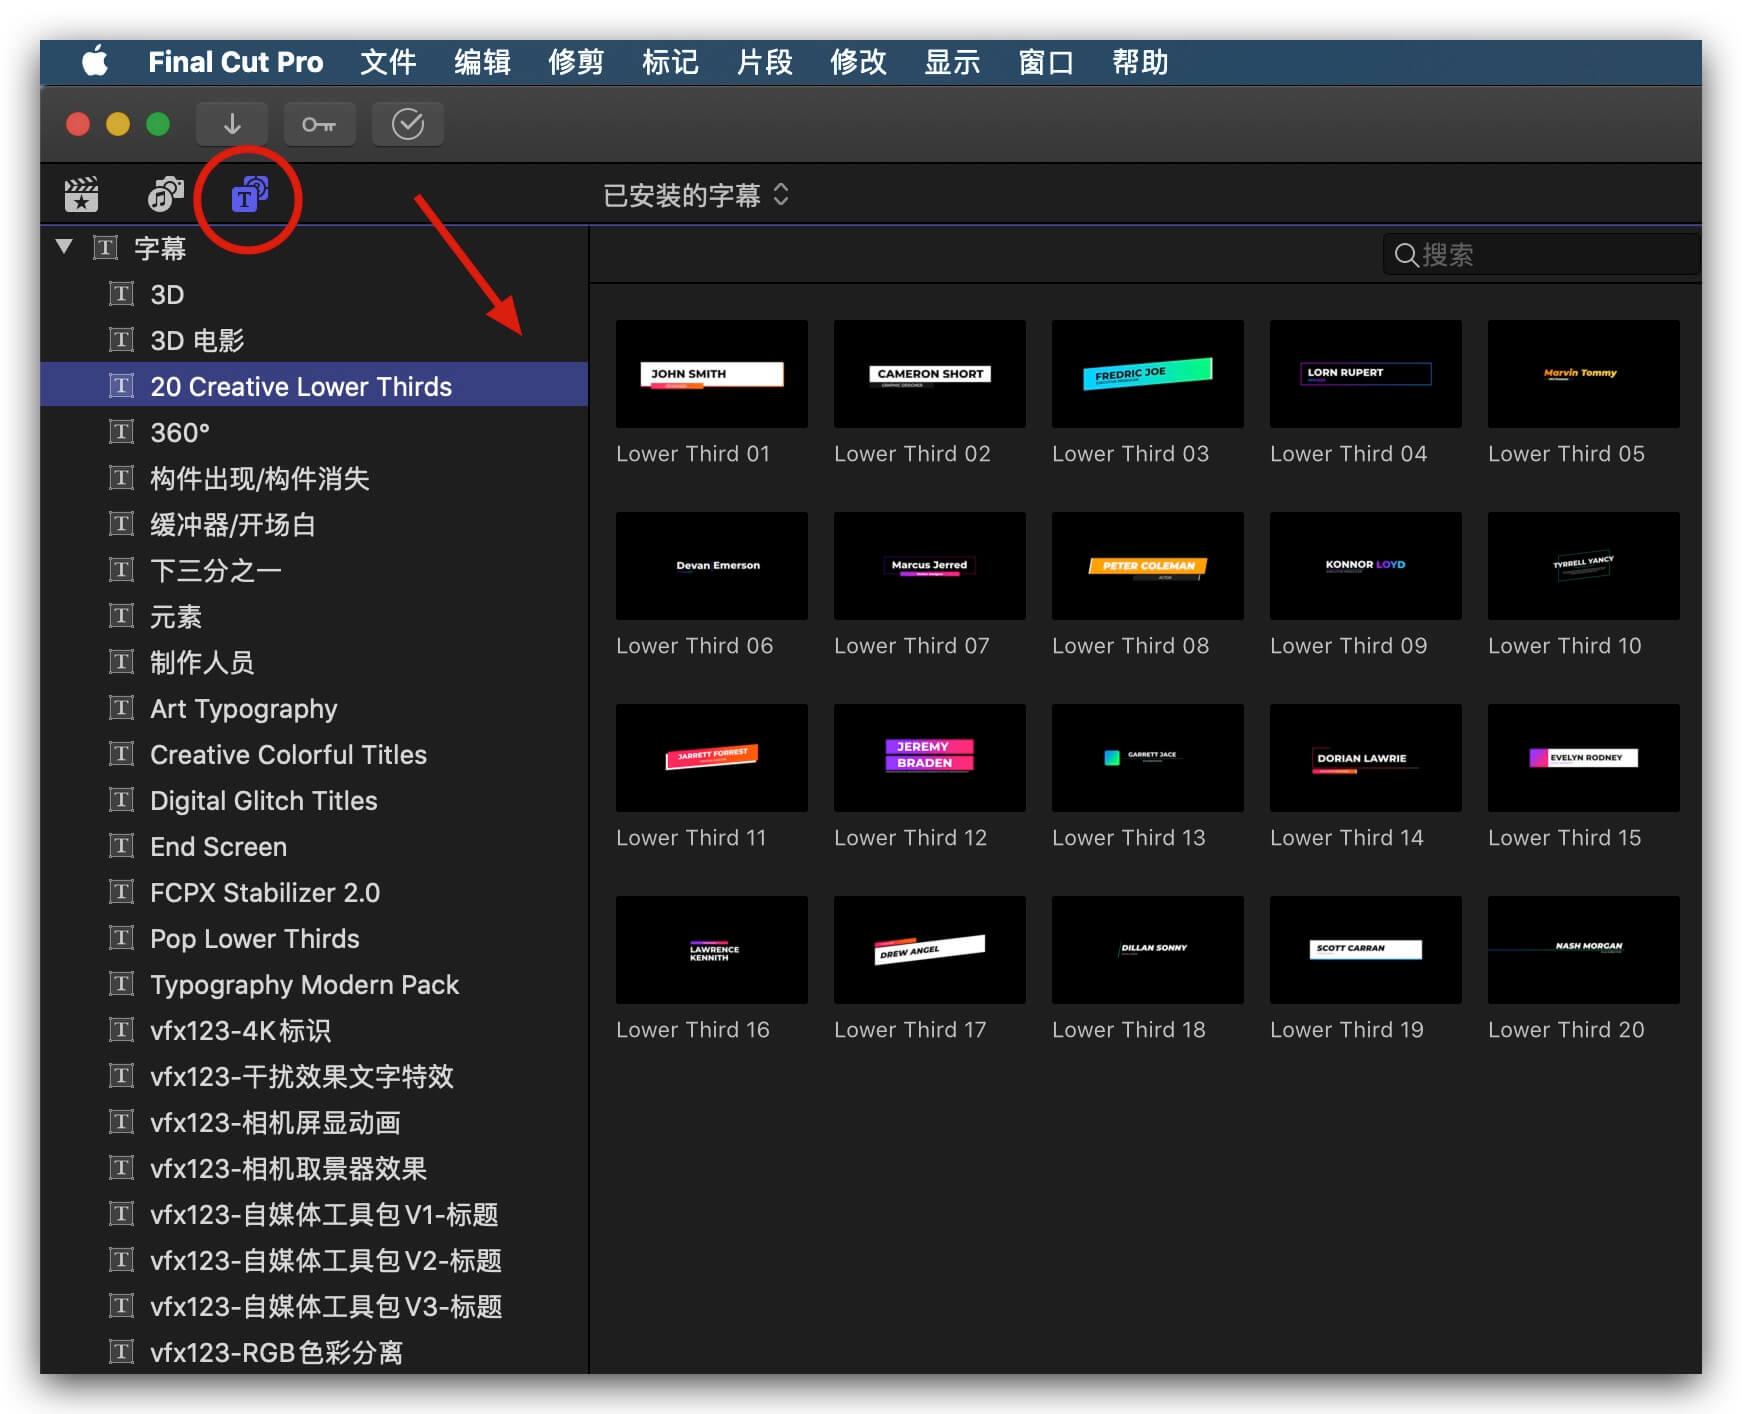 fcpx标题插件 20组创意迷你文字标题排版动画预设 Creative Lower Thirds